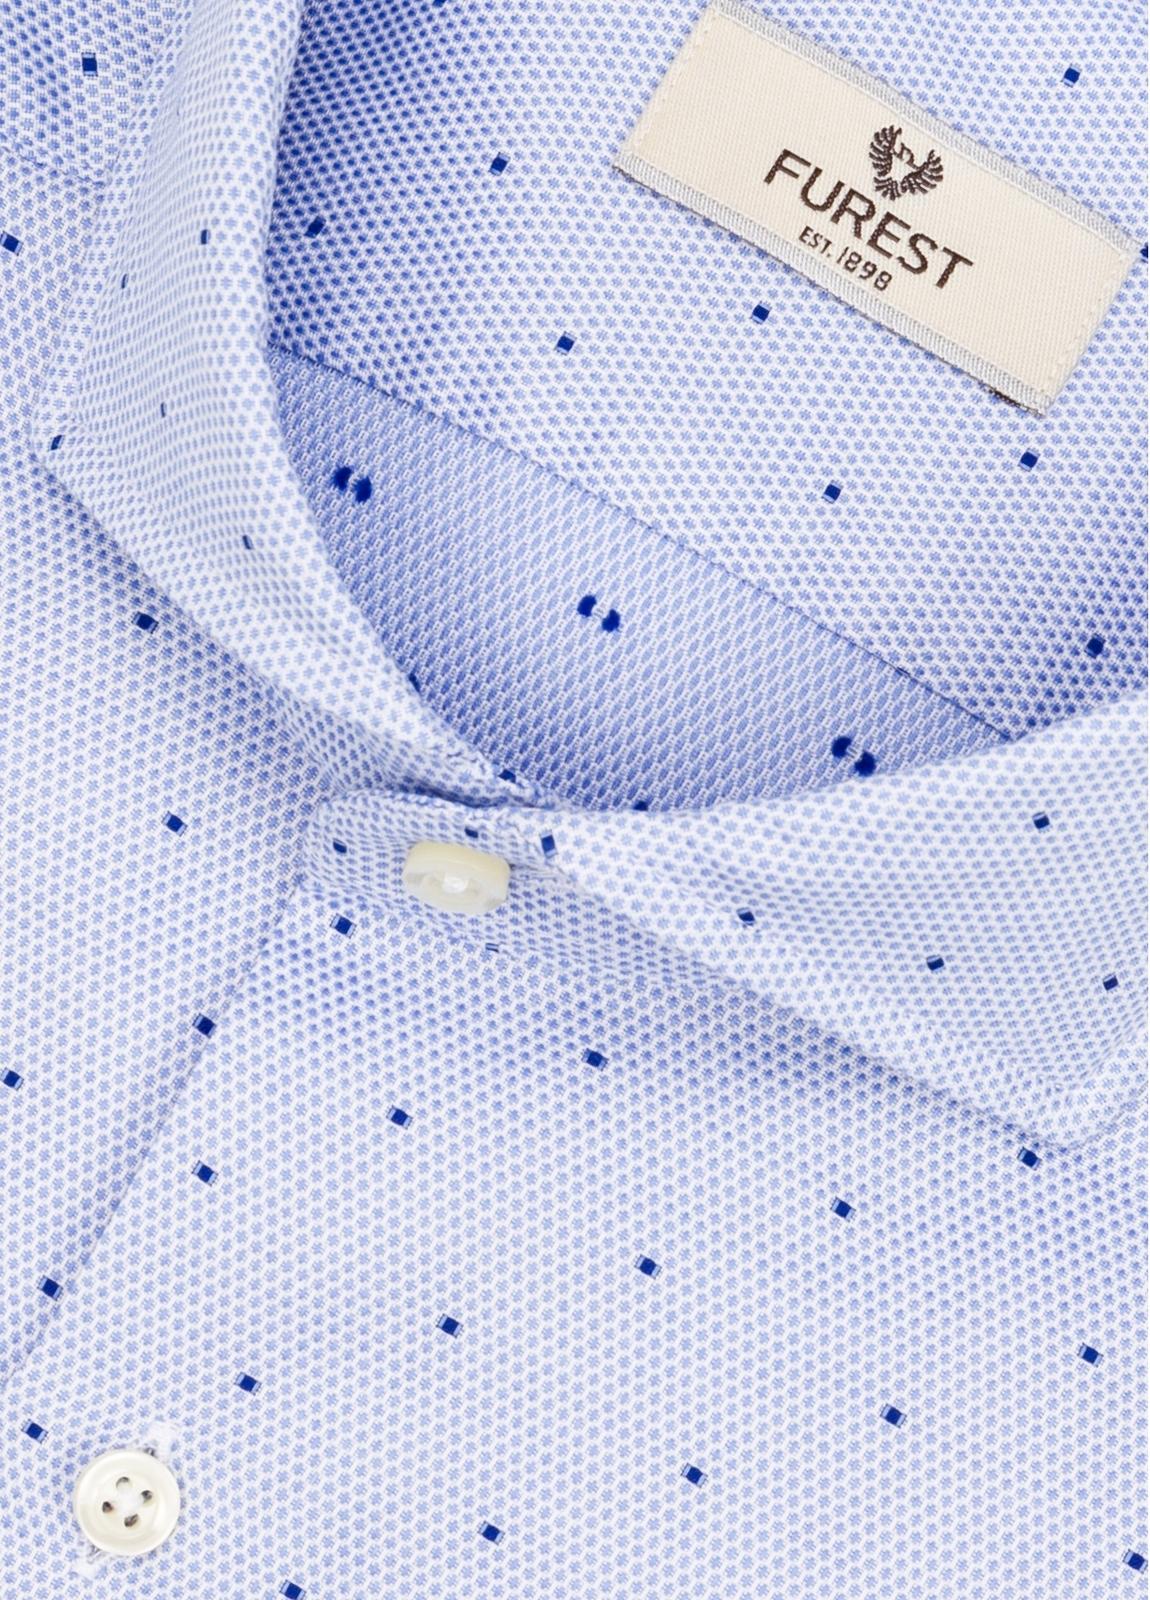 Camisa Leisure Wear SLIM FIT Modelo CAPRI color celeste con microdibujo. 100% Algodón. - Ítem1